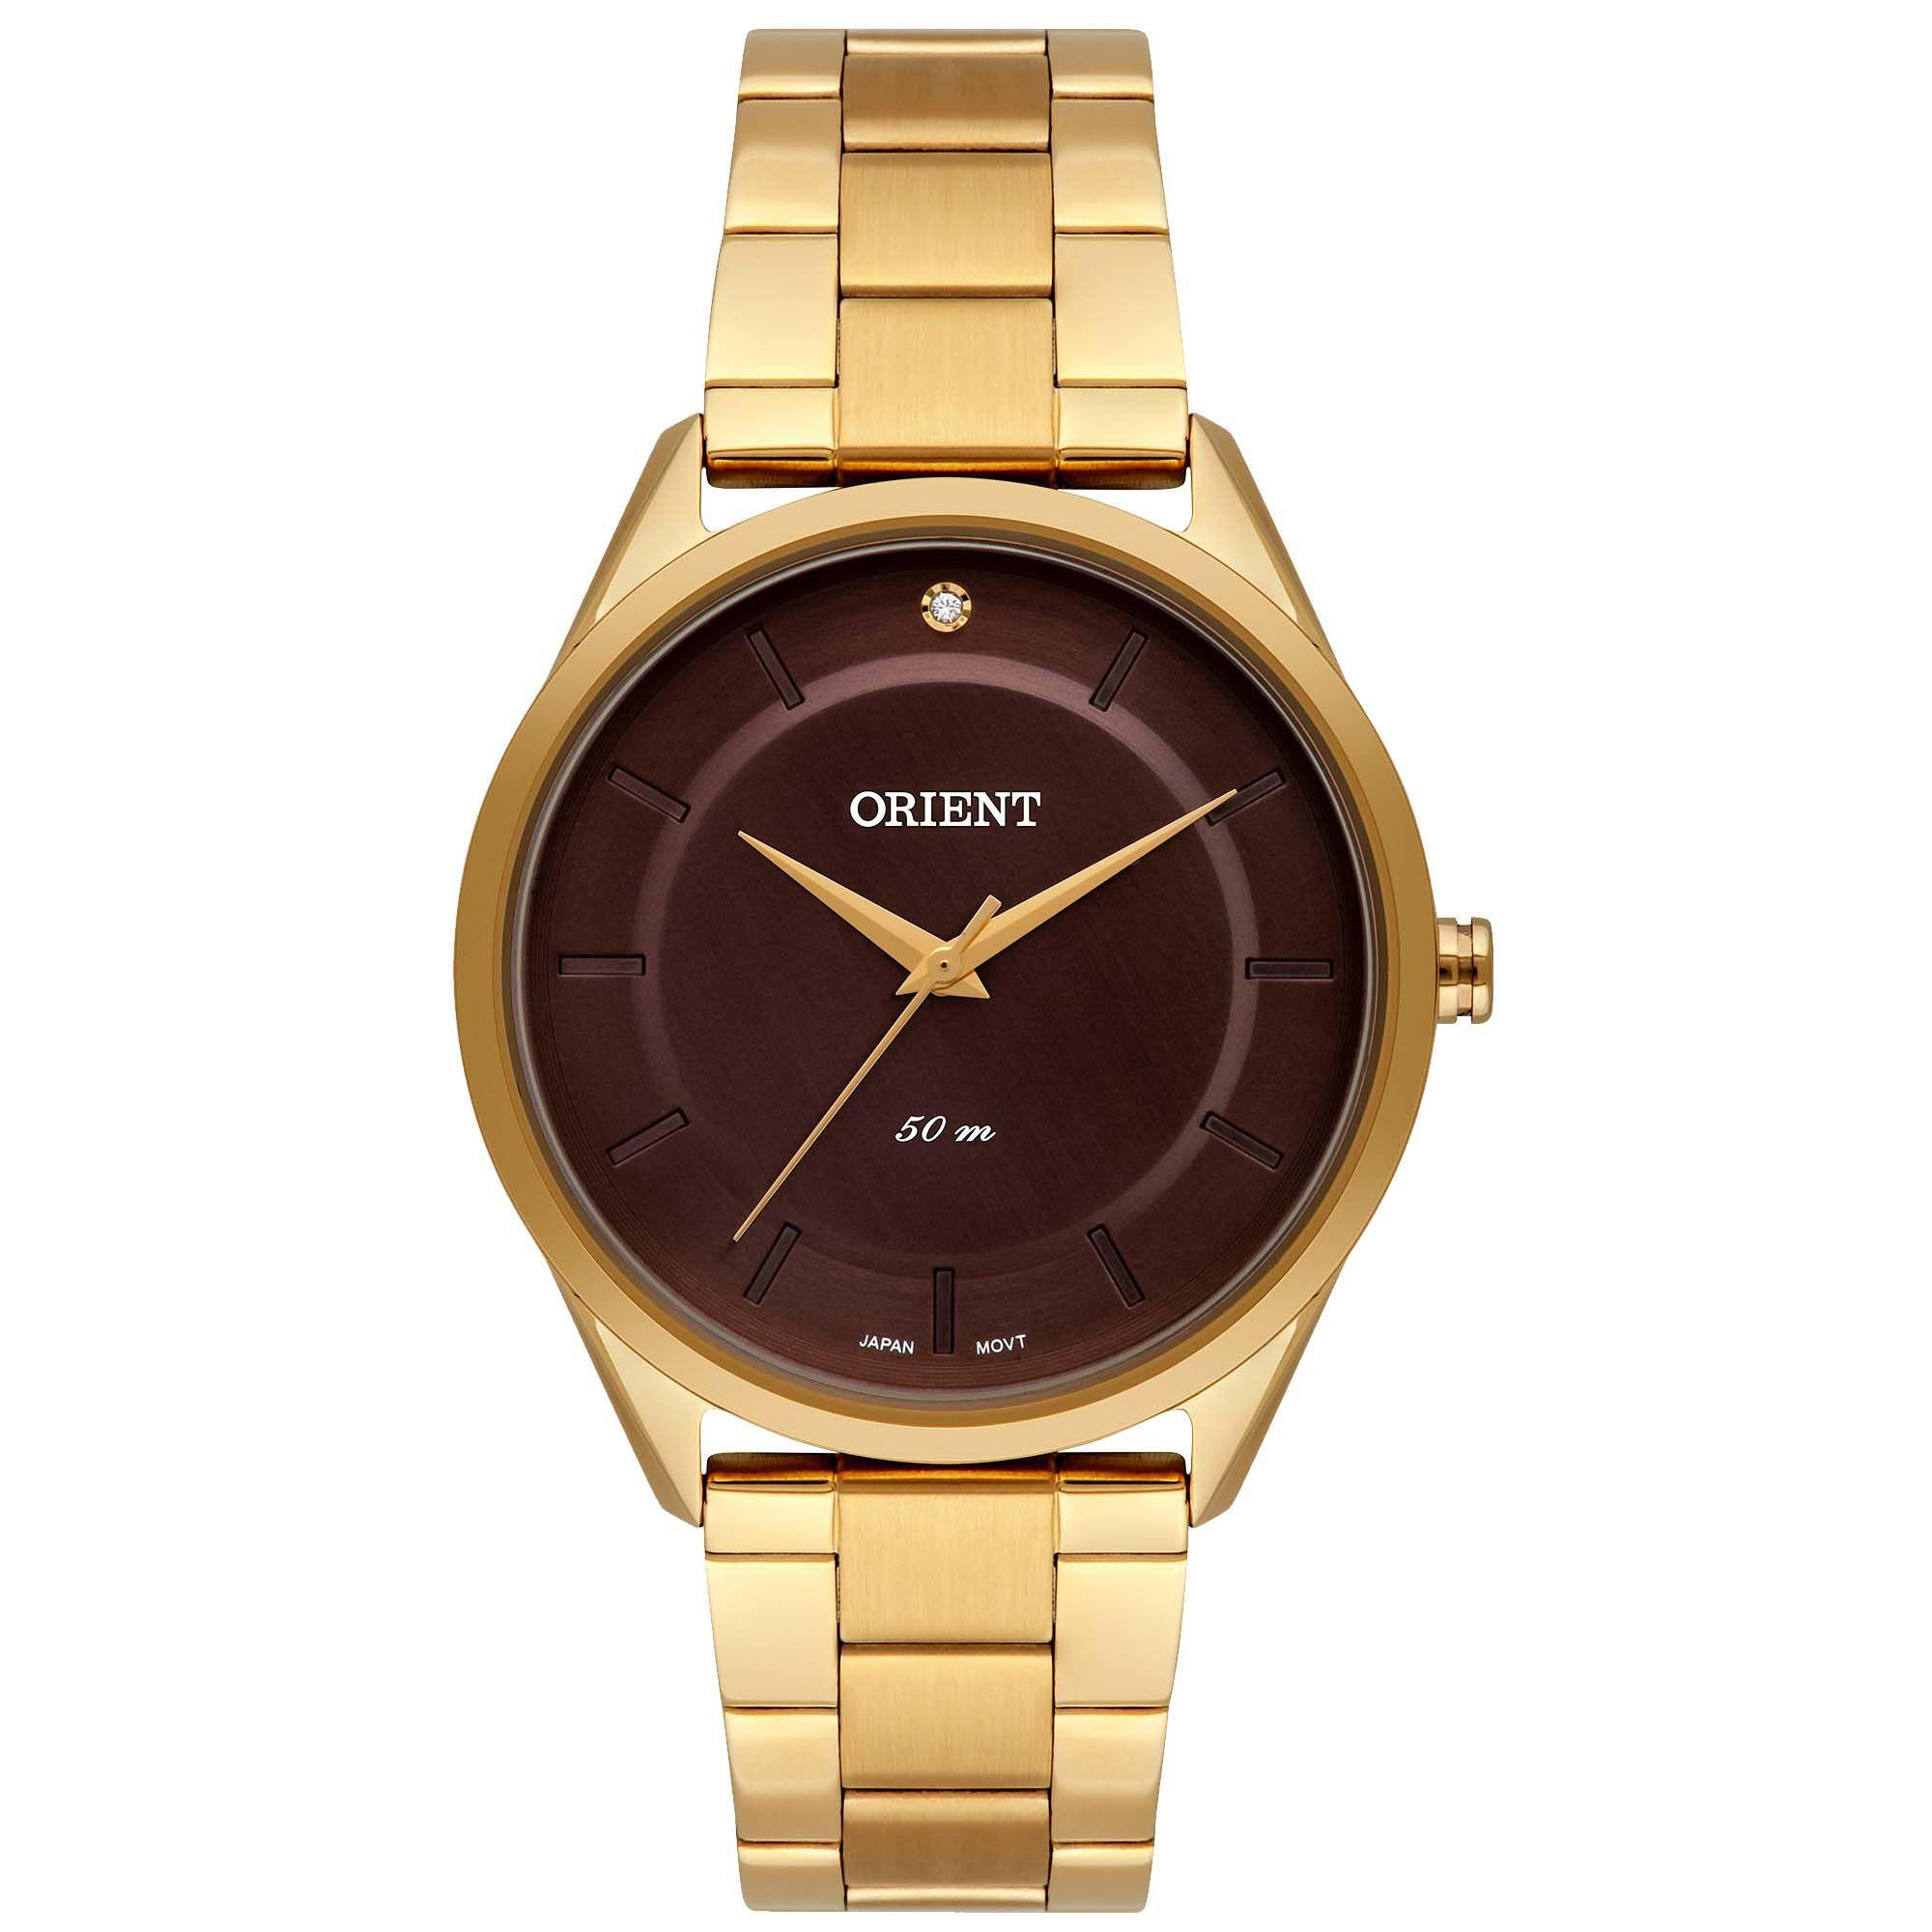 Relógio Feminino Orient FGSS0139 N1KX